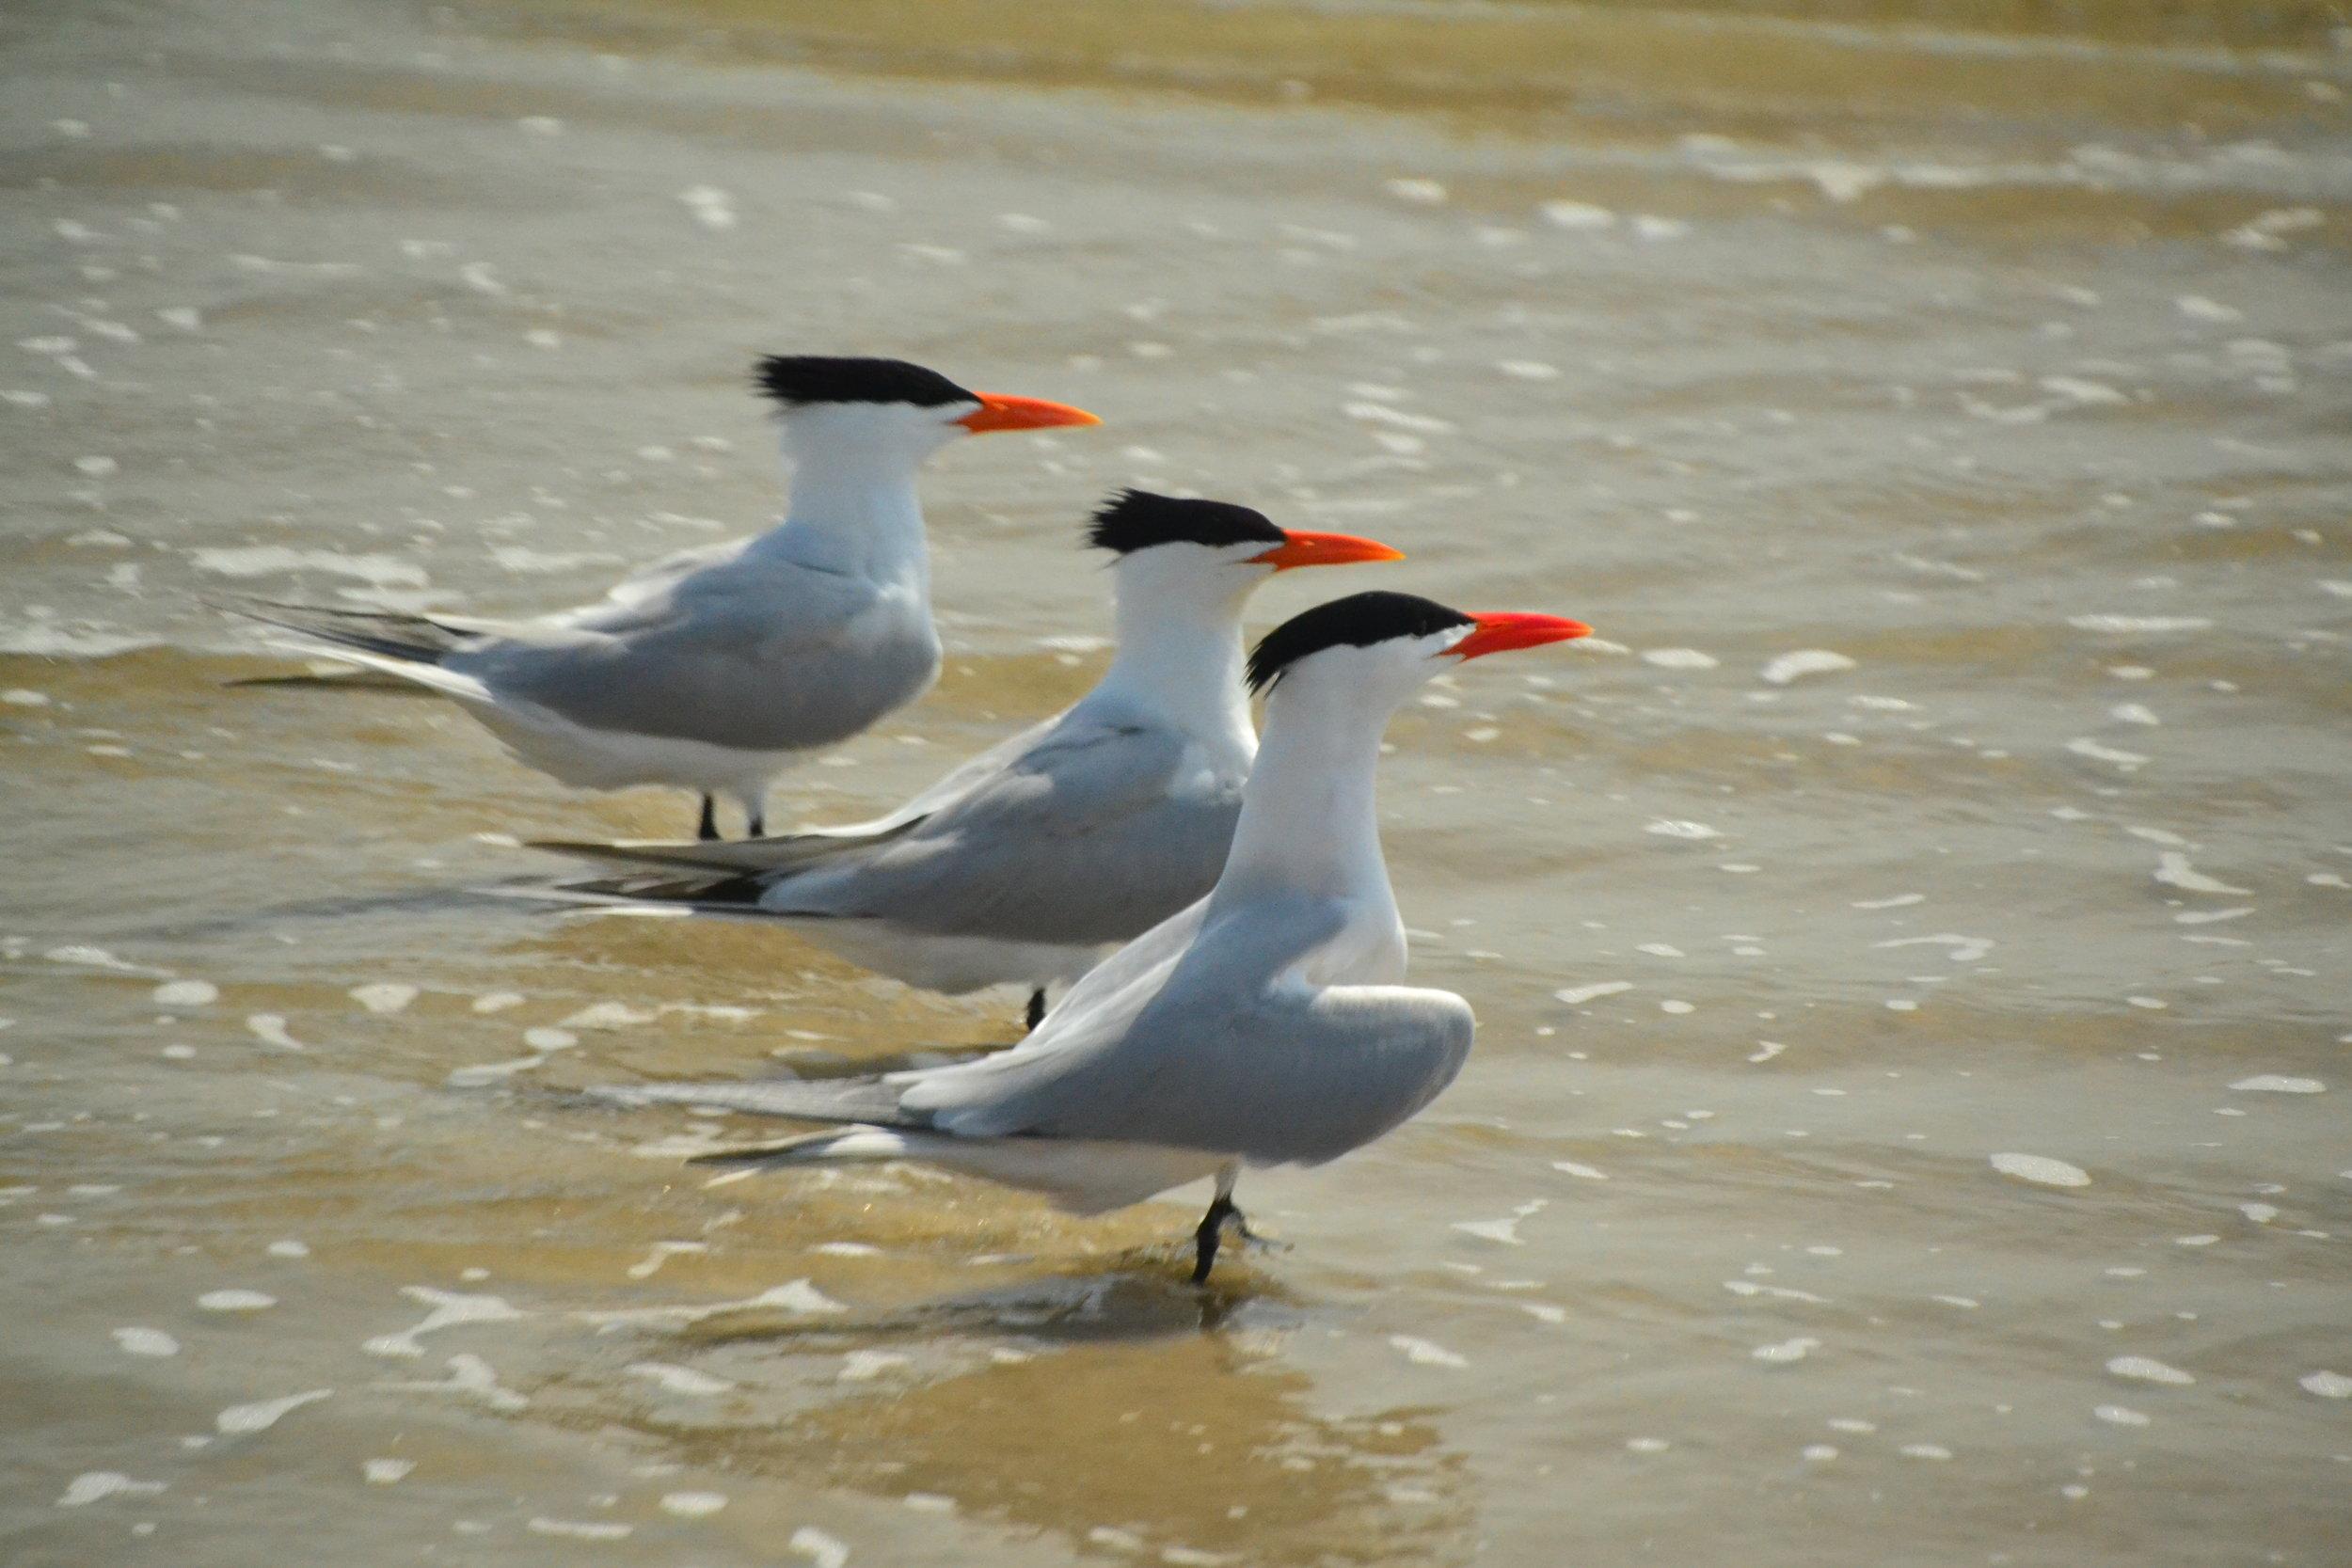 Royal Terns in breeding plumage